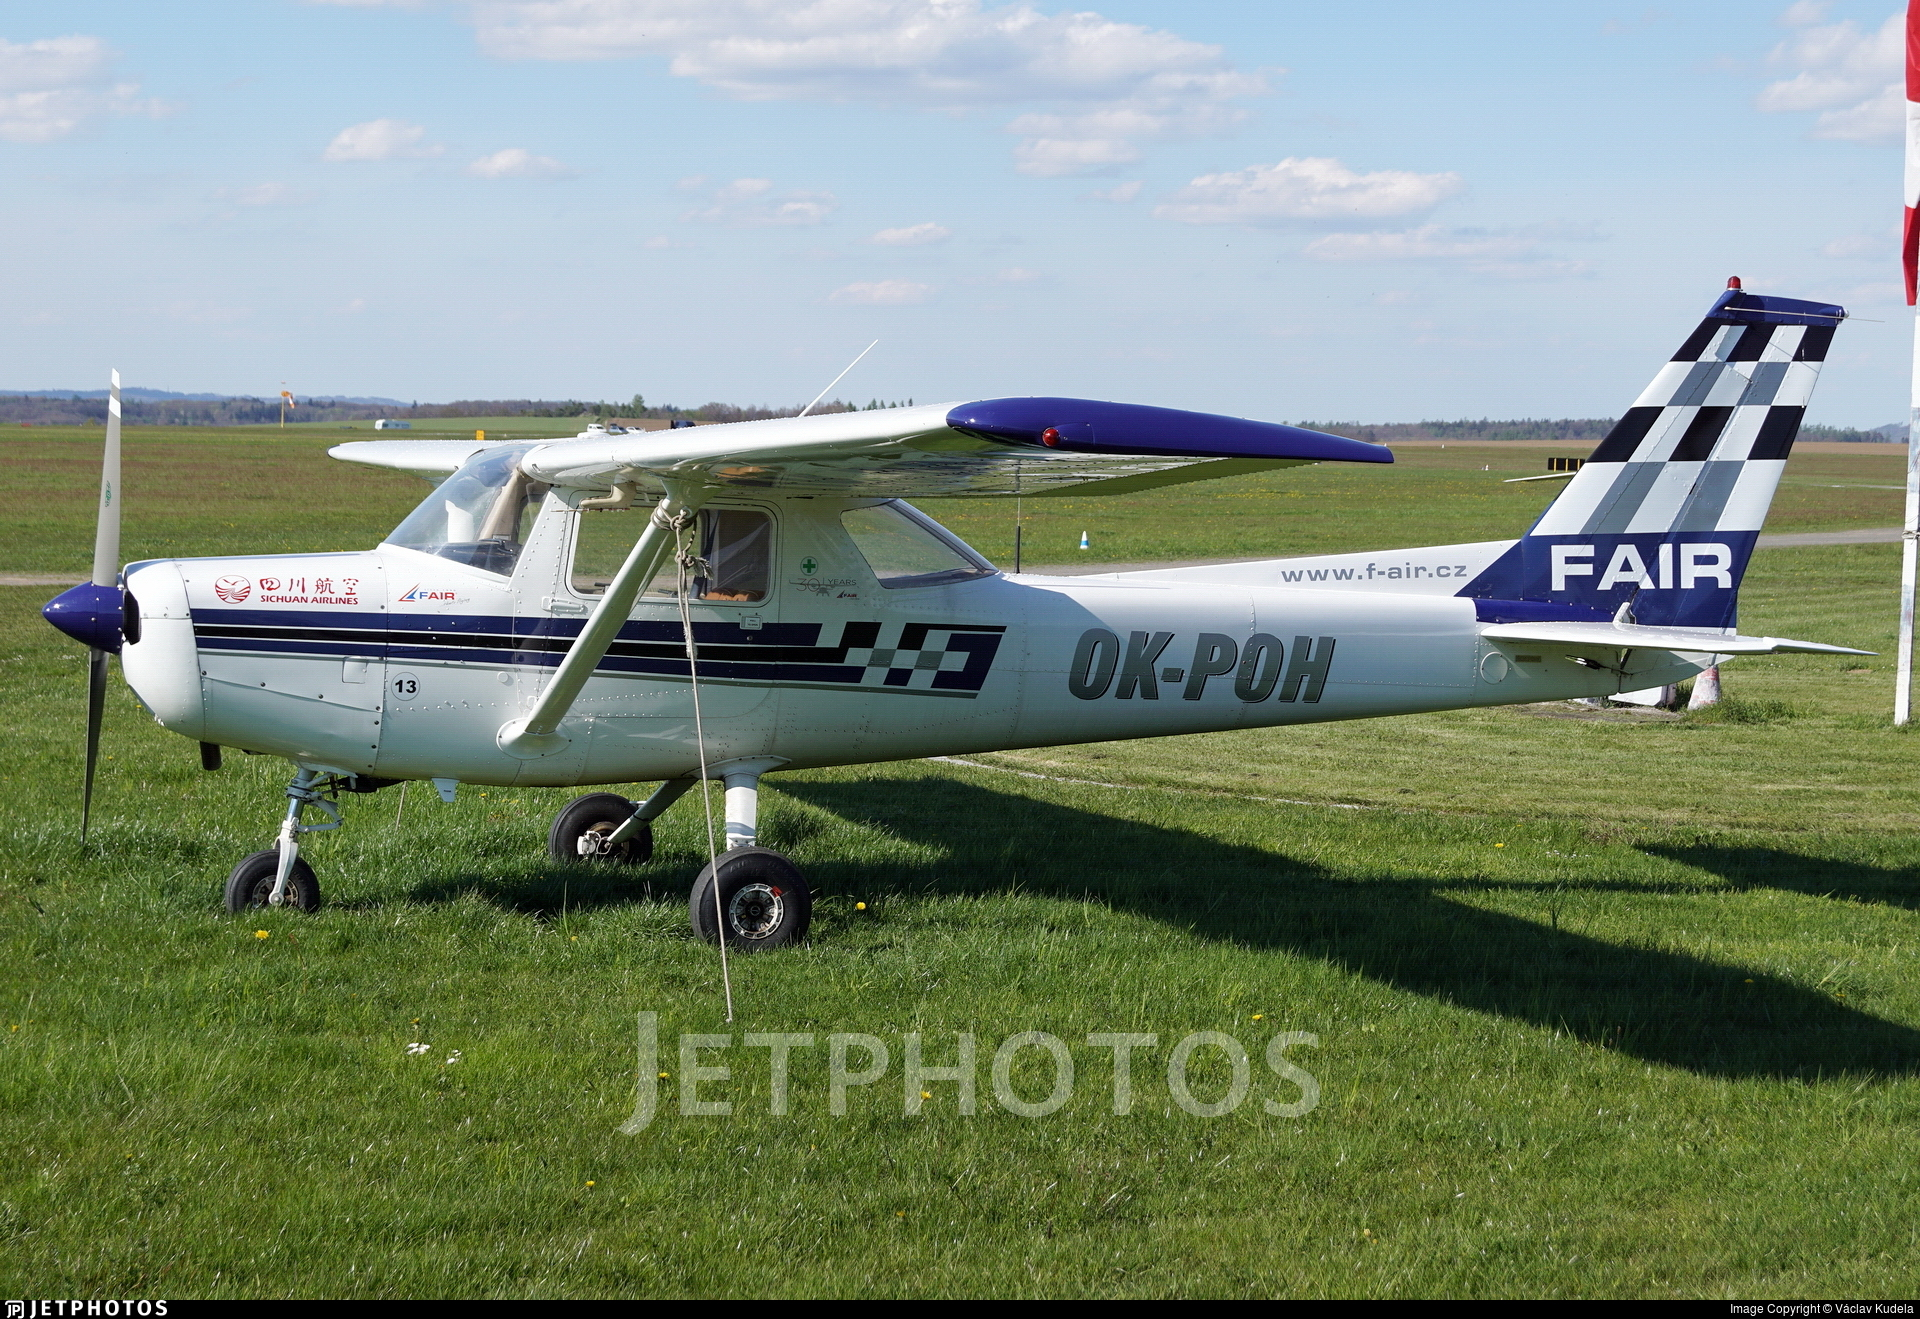 OK-POH - Reims-Cessna F152 - F Air